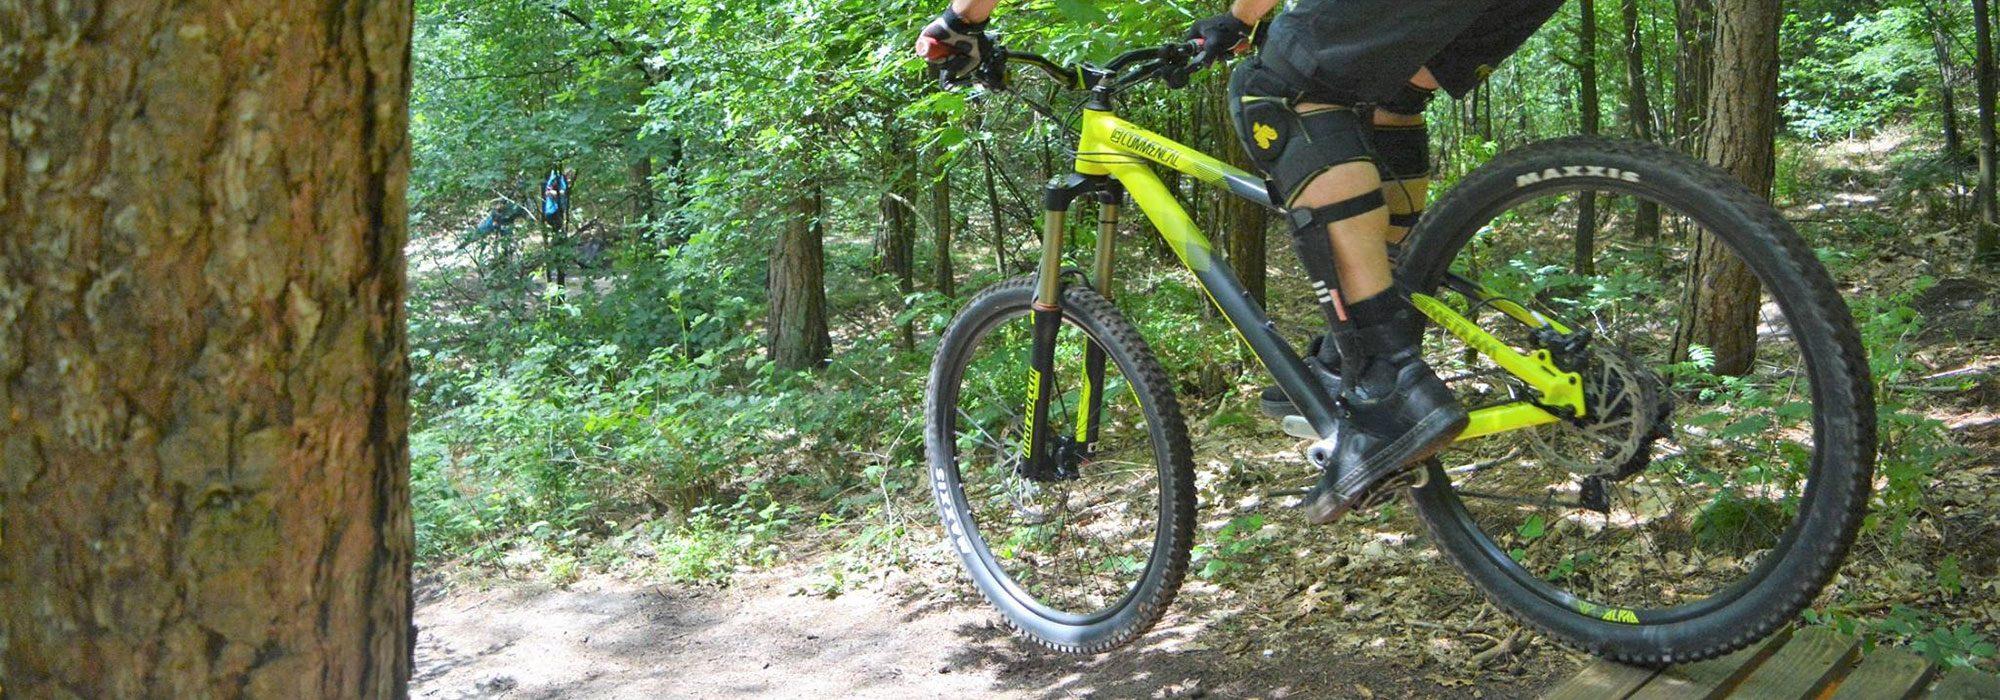 mtbclinic.nl mountainbike clinics freeride